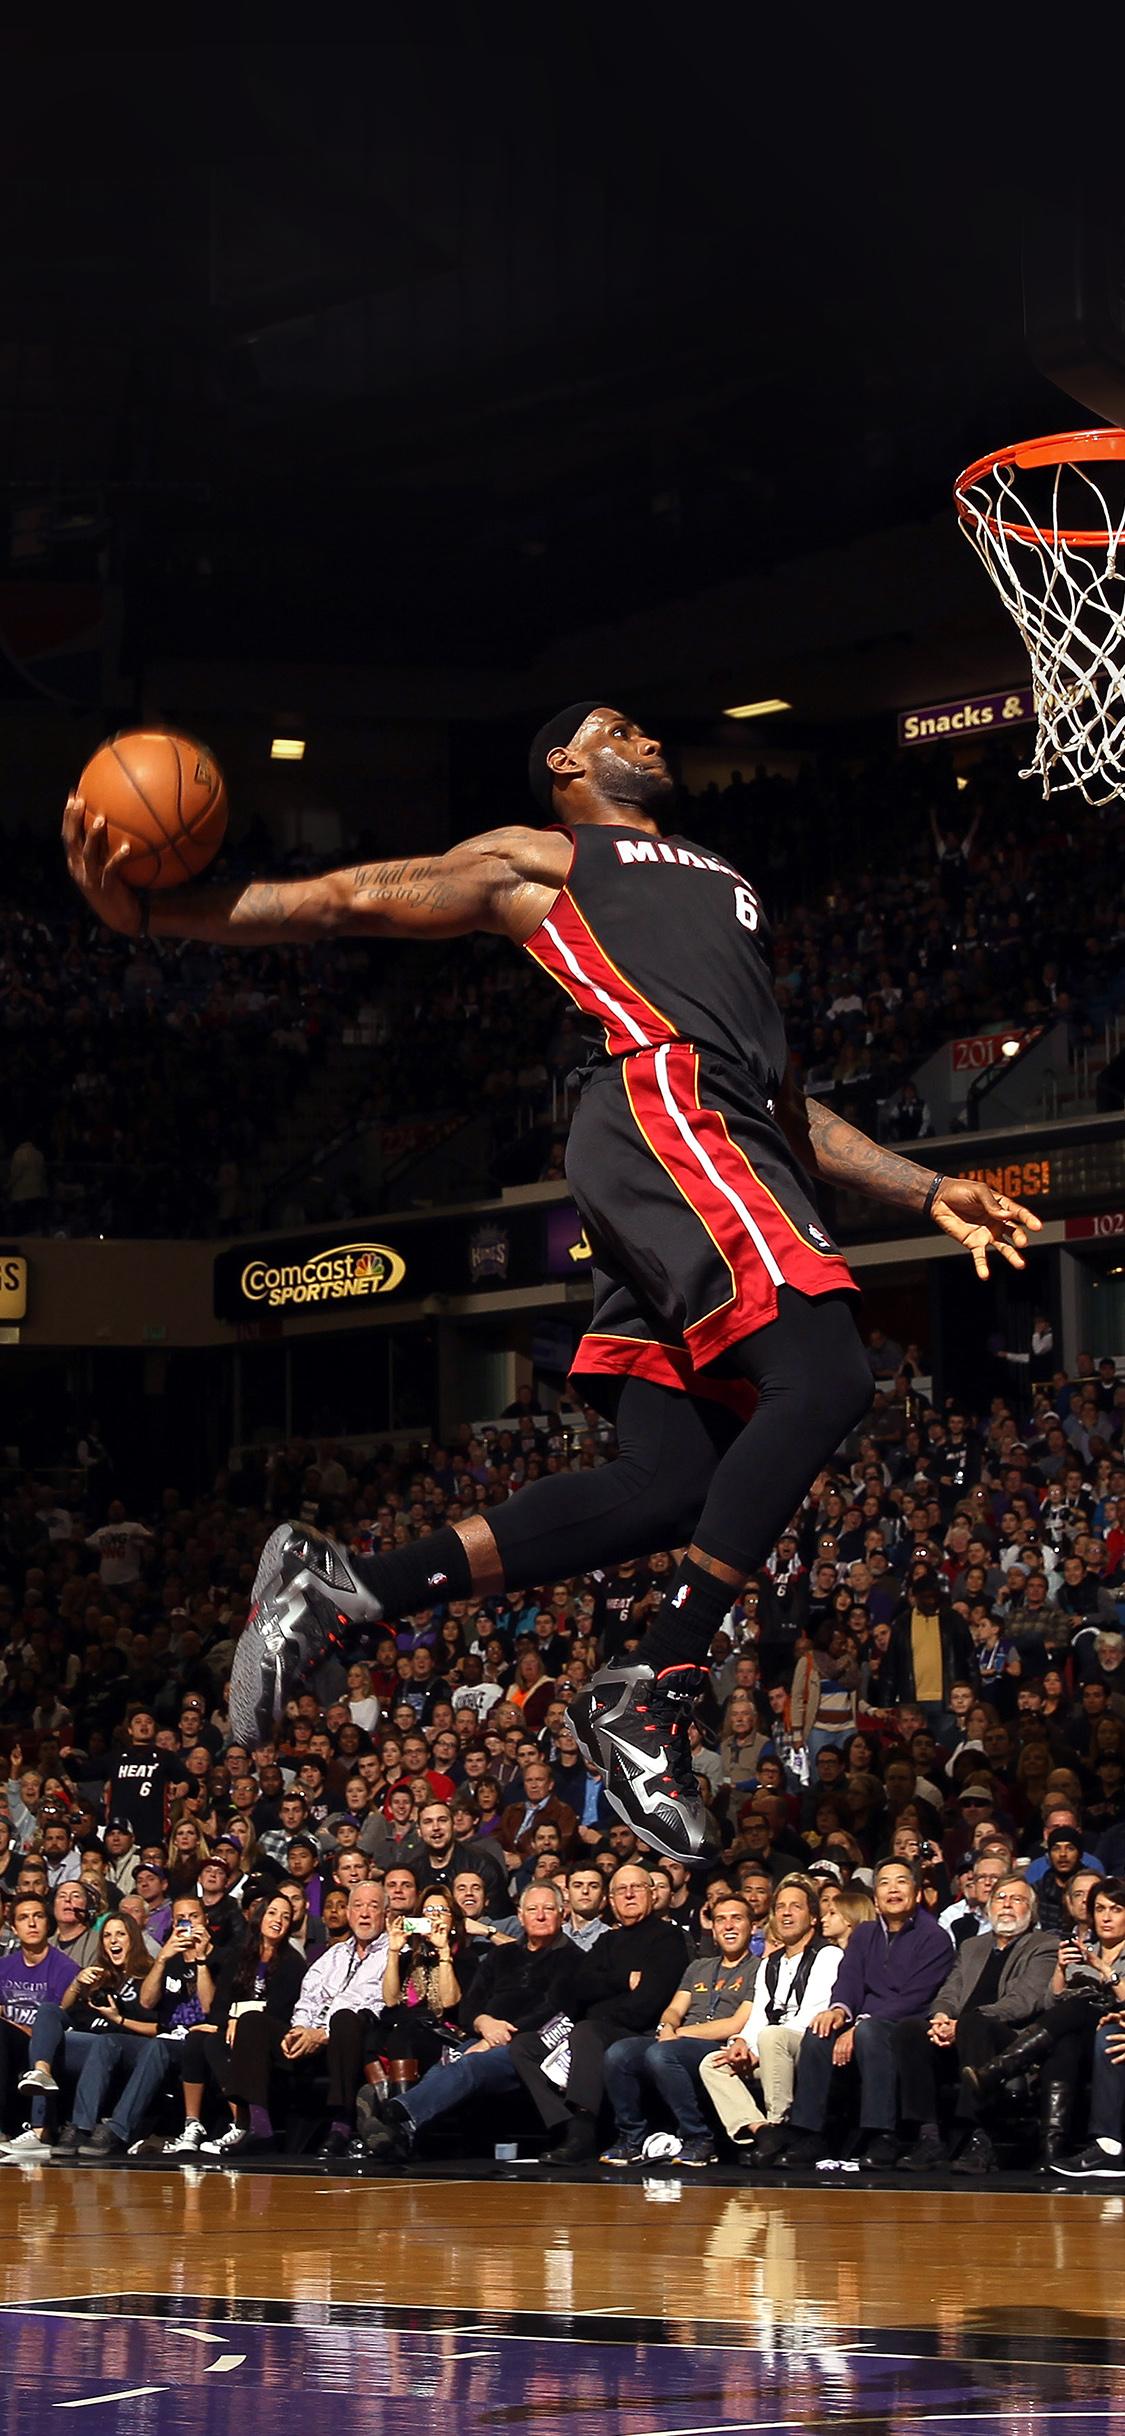 Car Wallpaper Hd Iphone 4 He99 Lebron James Dunk Nba Sports Art Basketball Papers Co